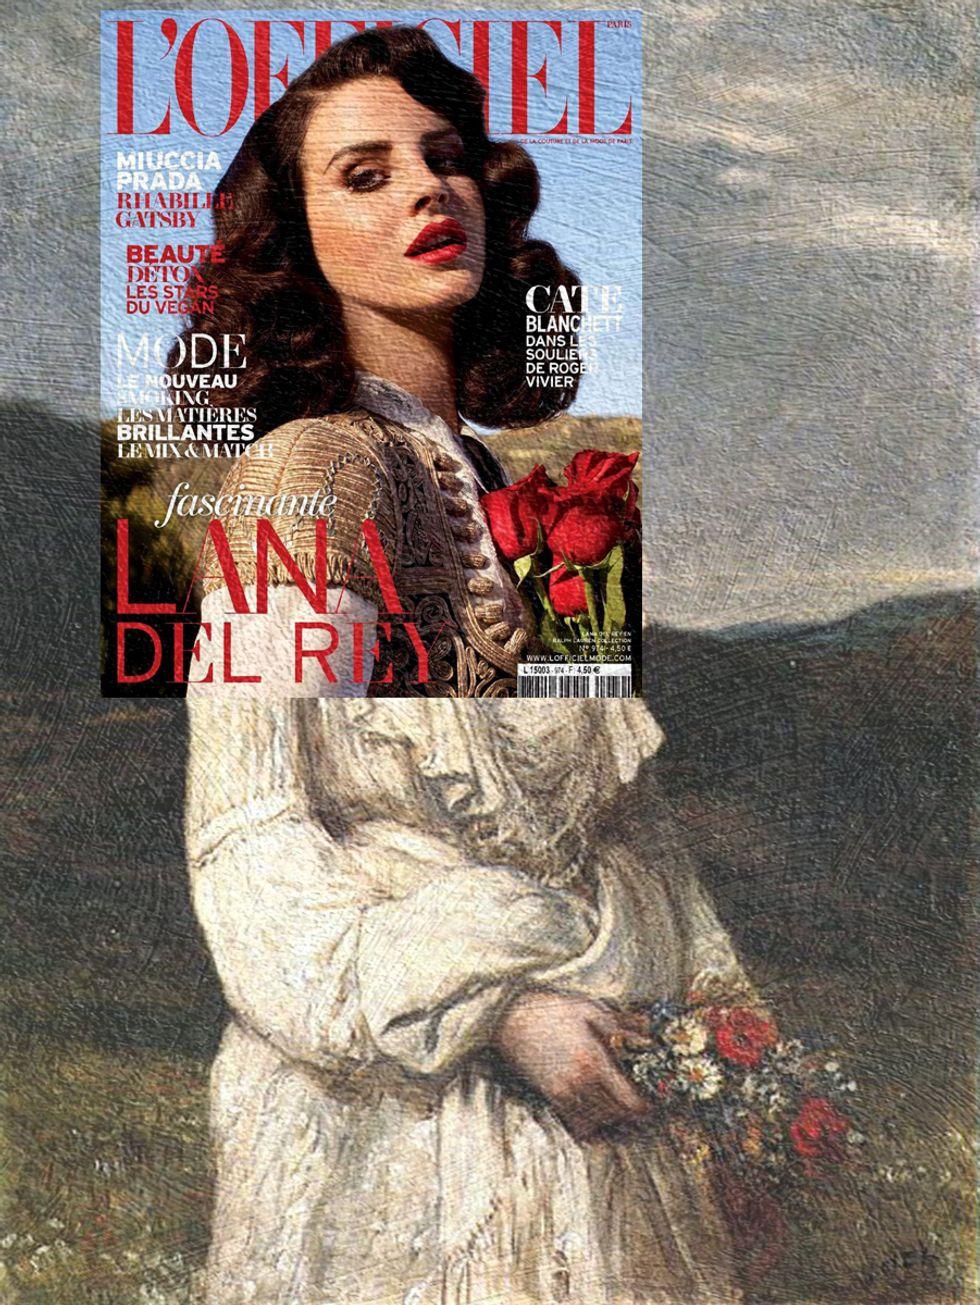 Mag + Art Turns Lana Del Rey, Cara Delevingne and More Into Masterpieces